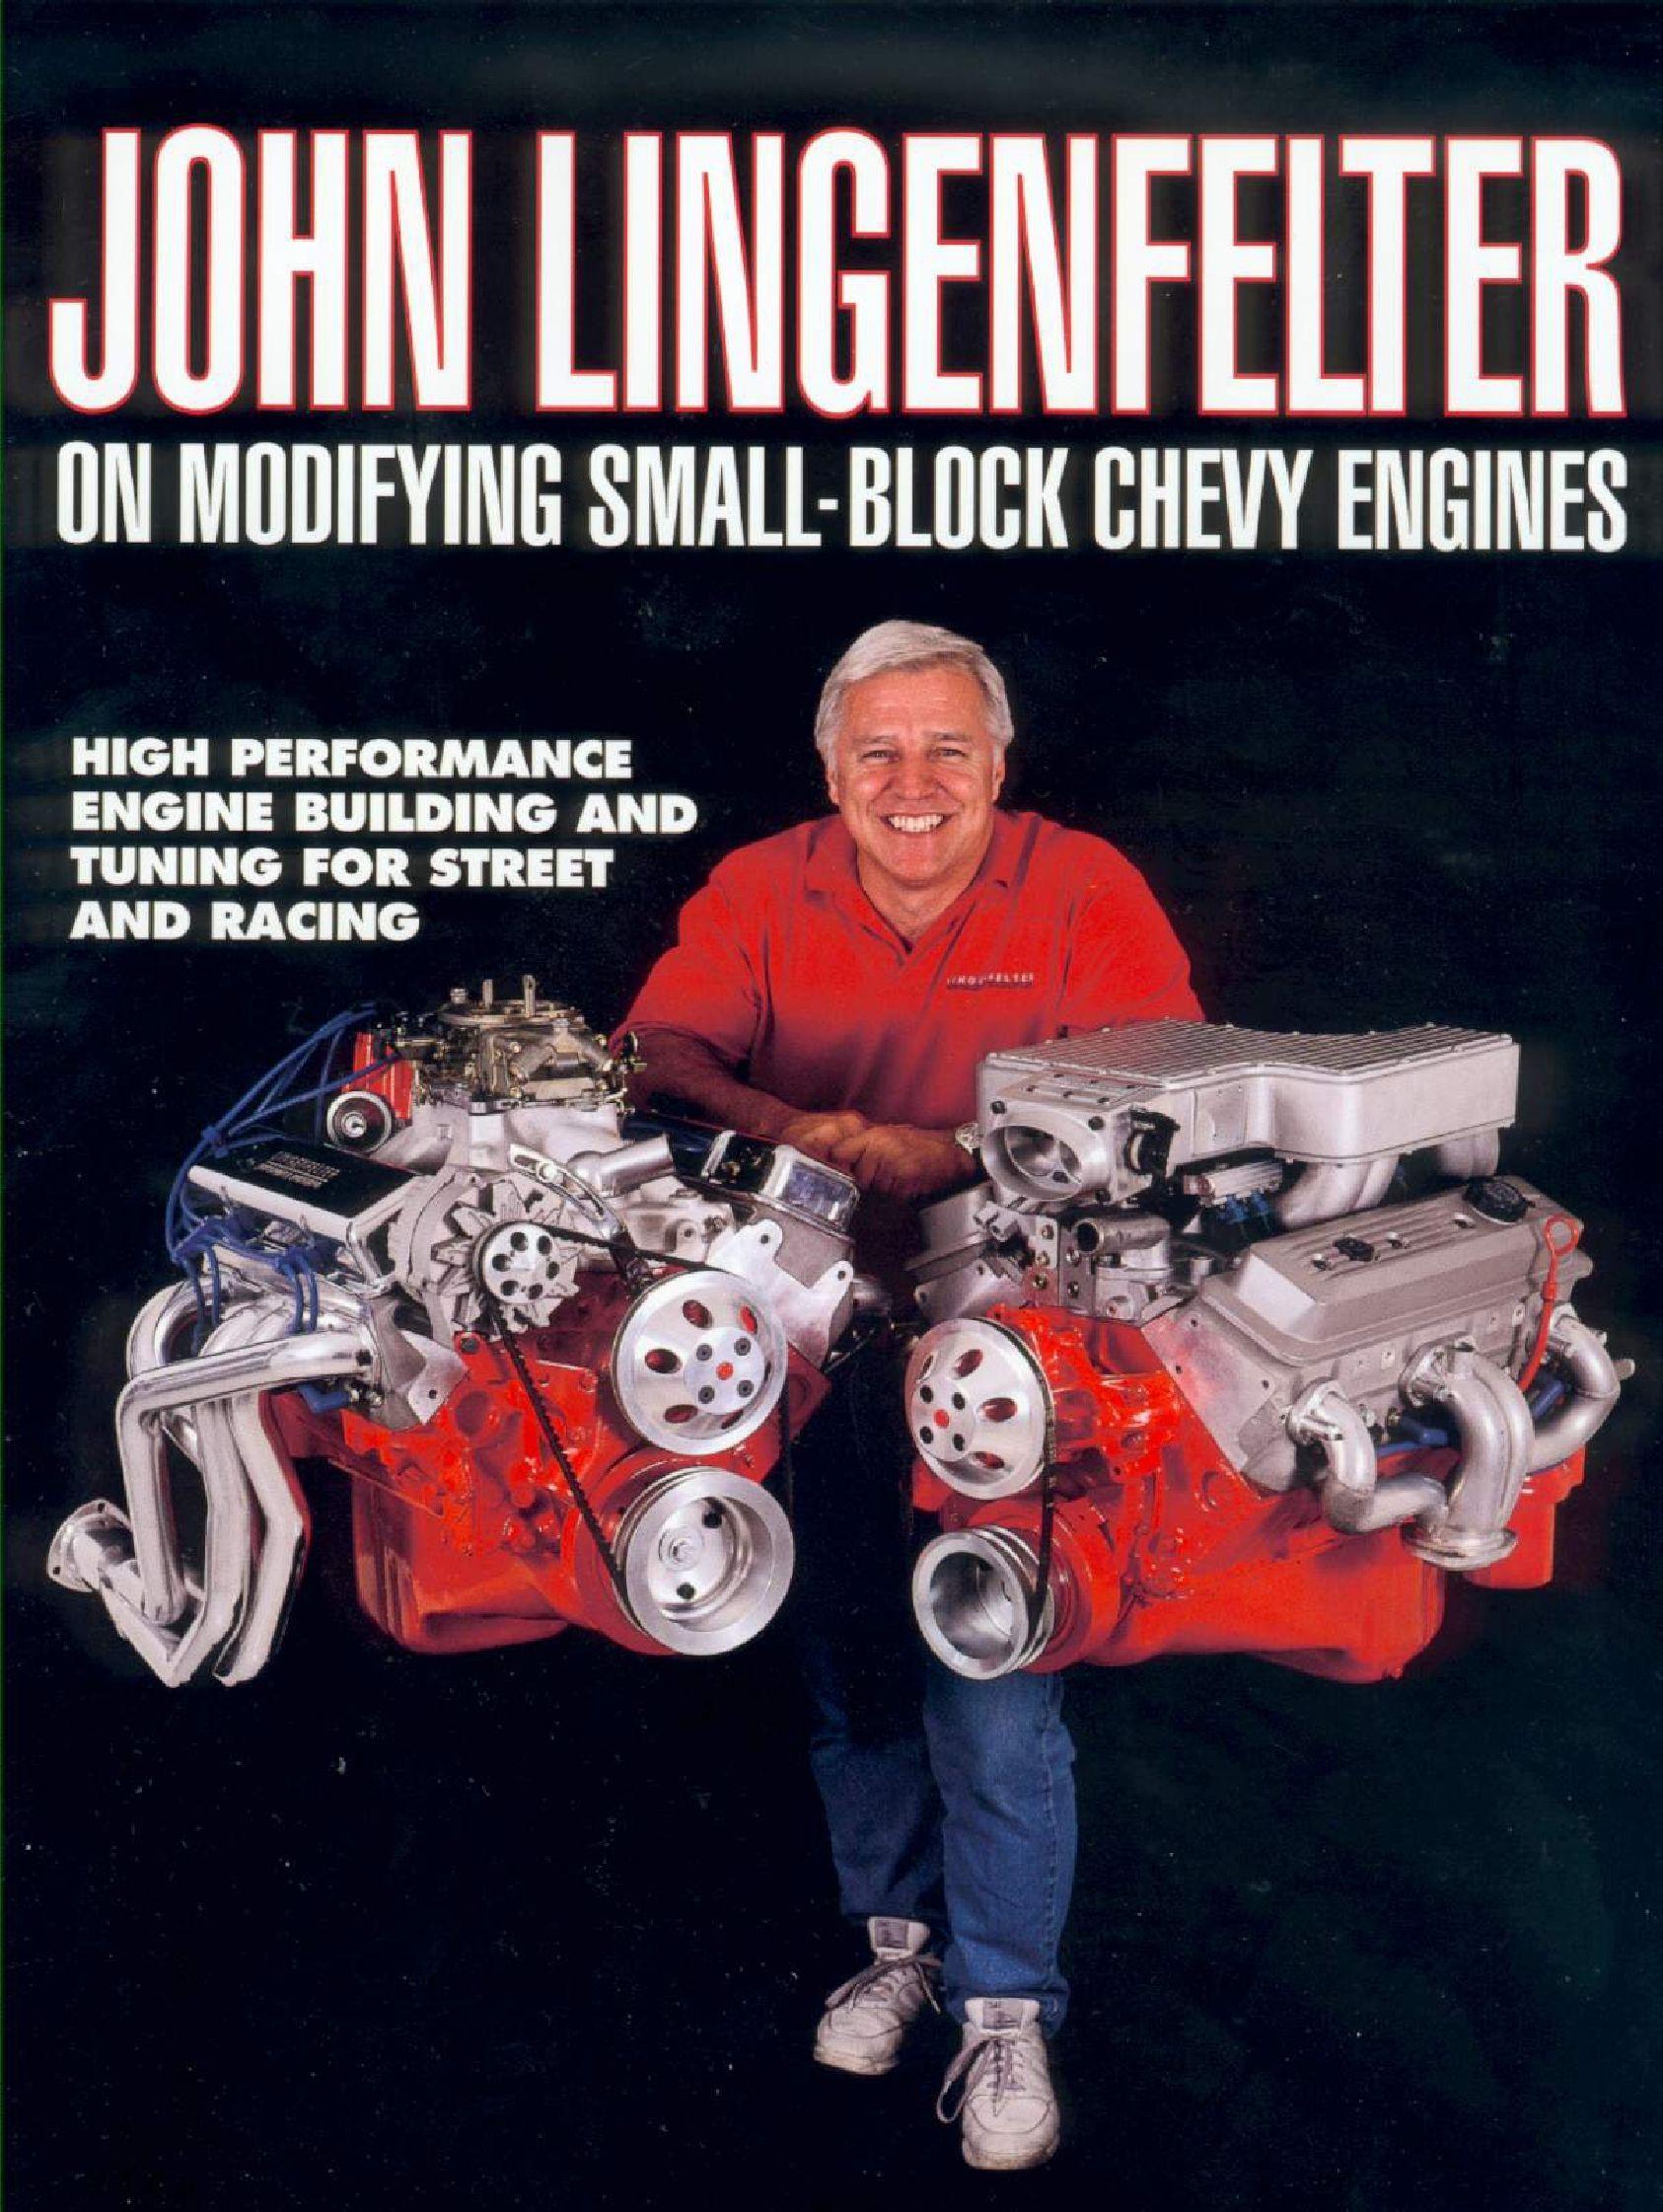 Modyfying Small Block Chevy Engines